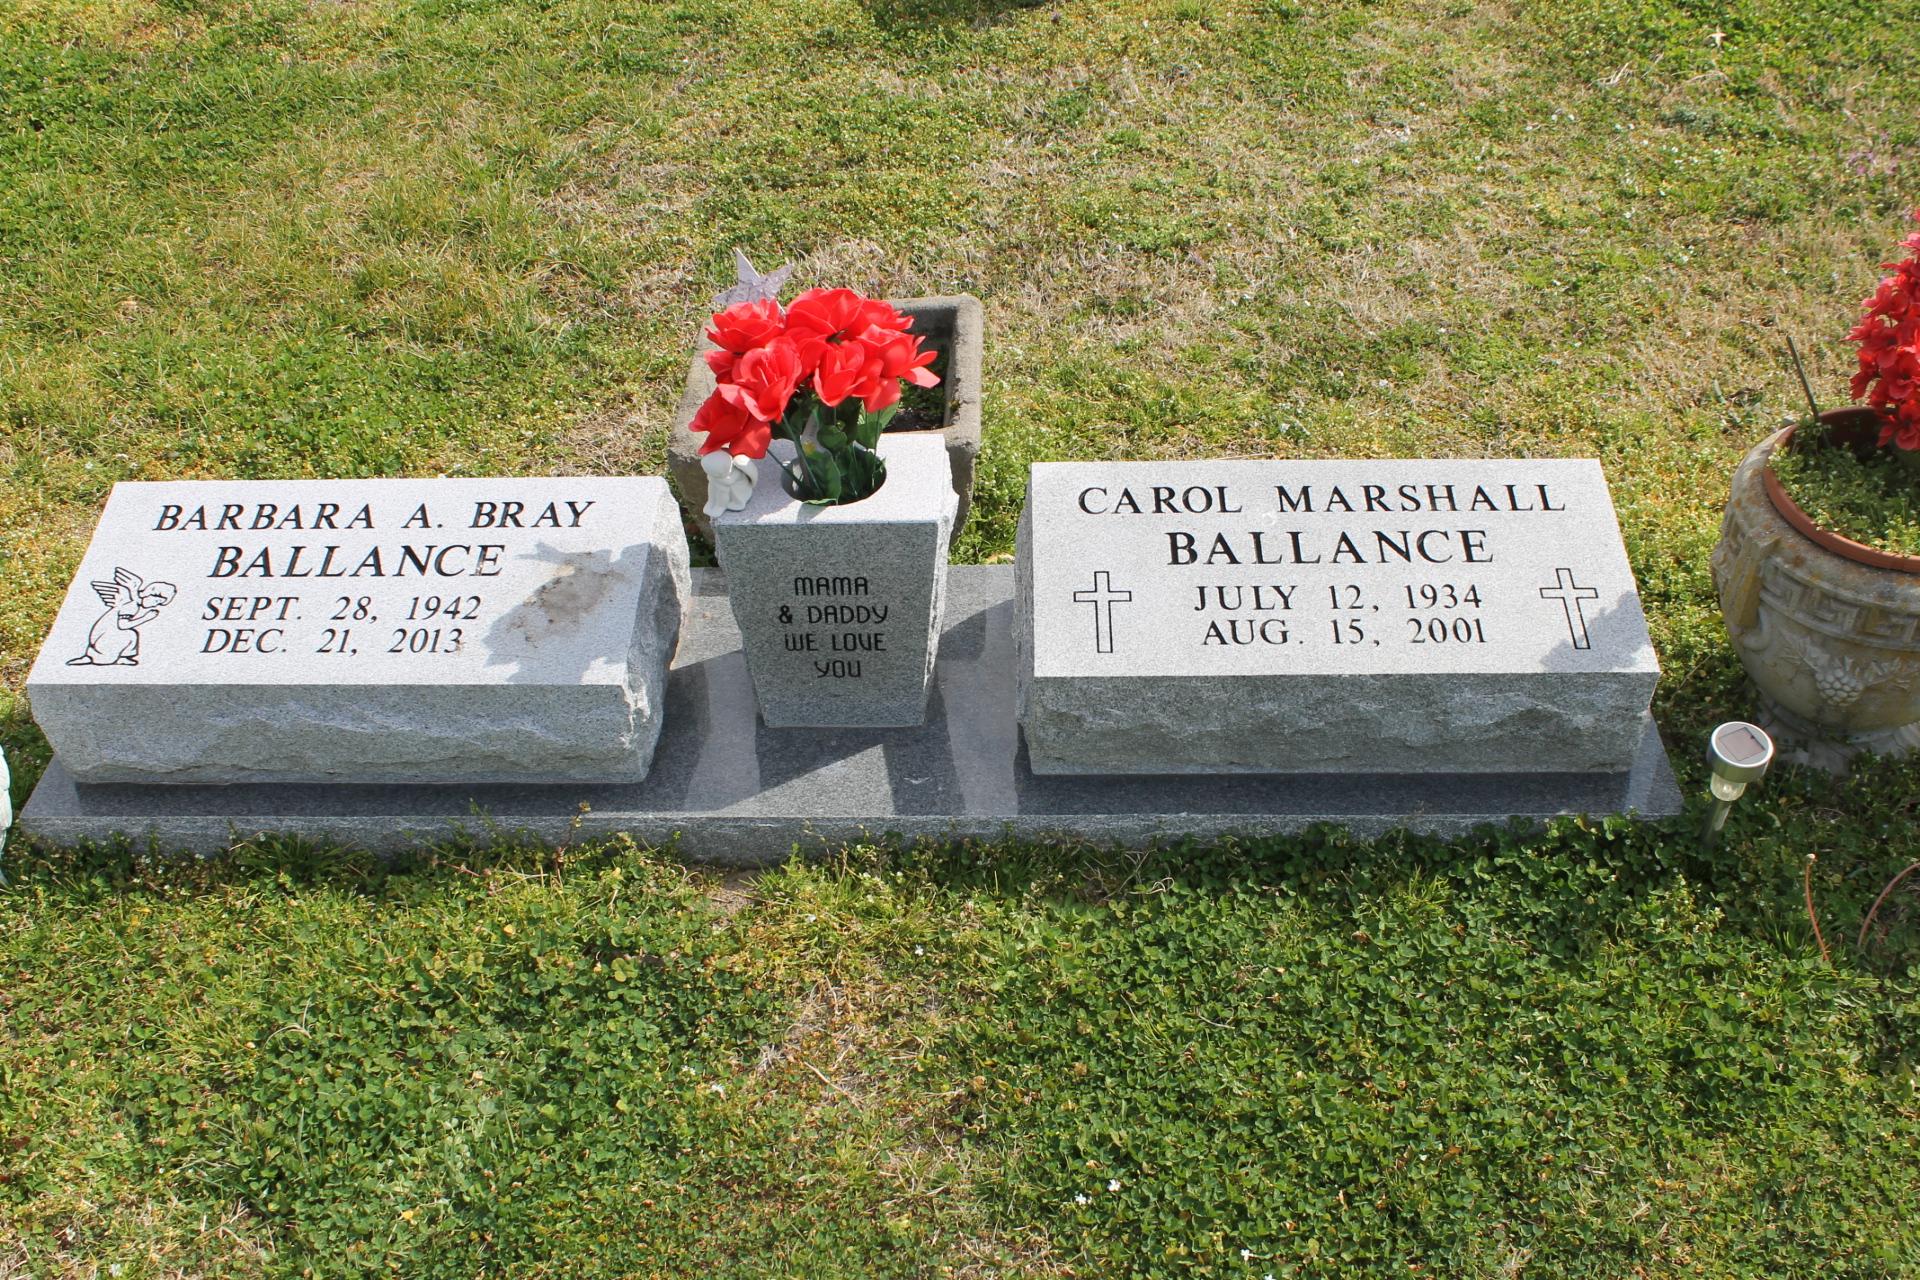 Rev Carol Marshall Ballance